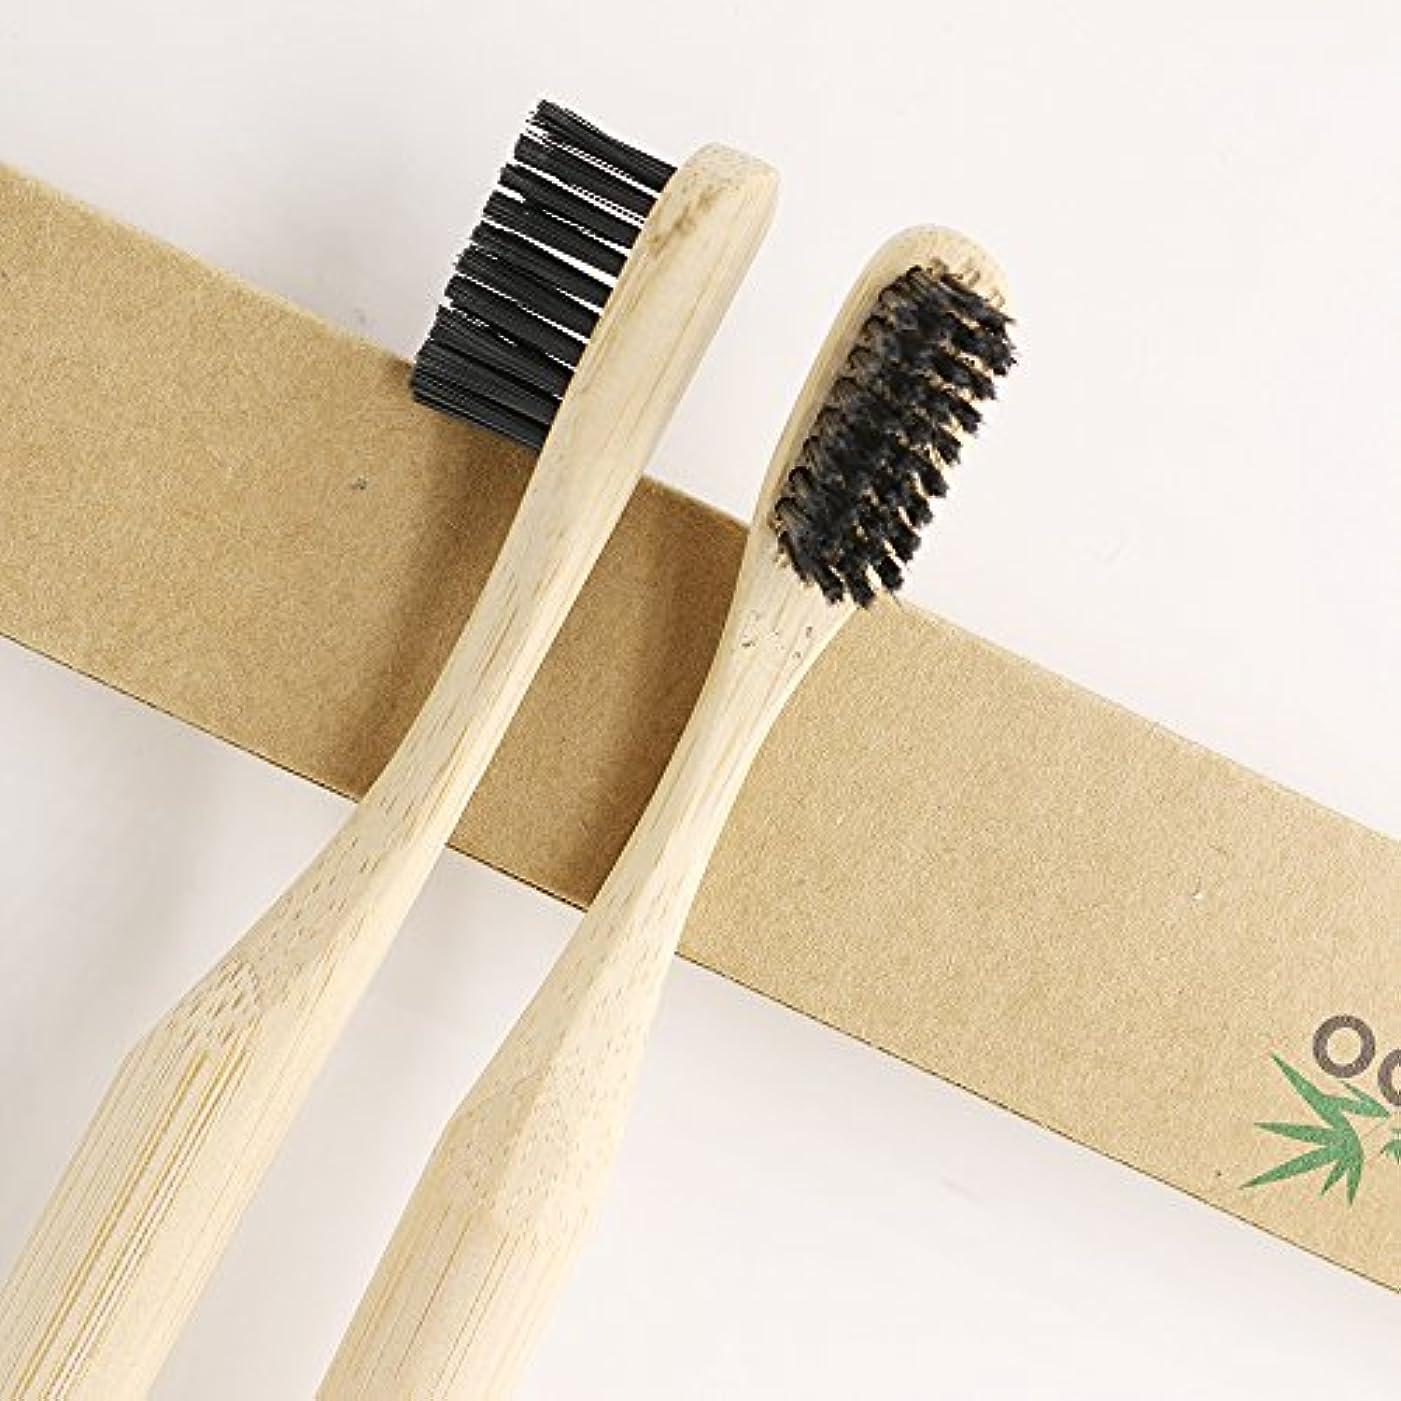 N-amboo 竹製耐久度高い 歯ブラシ  2本入り セット 黒い